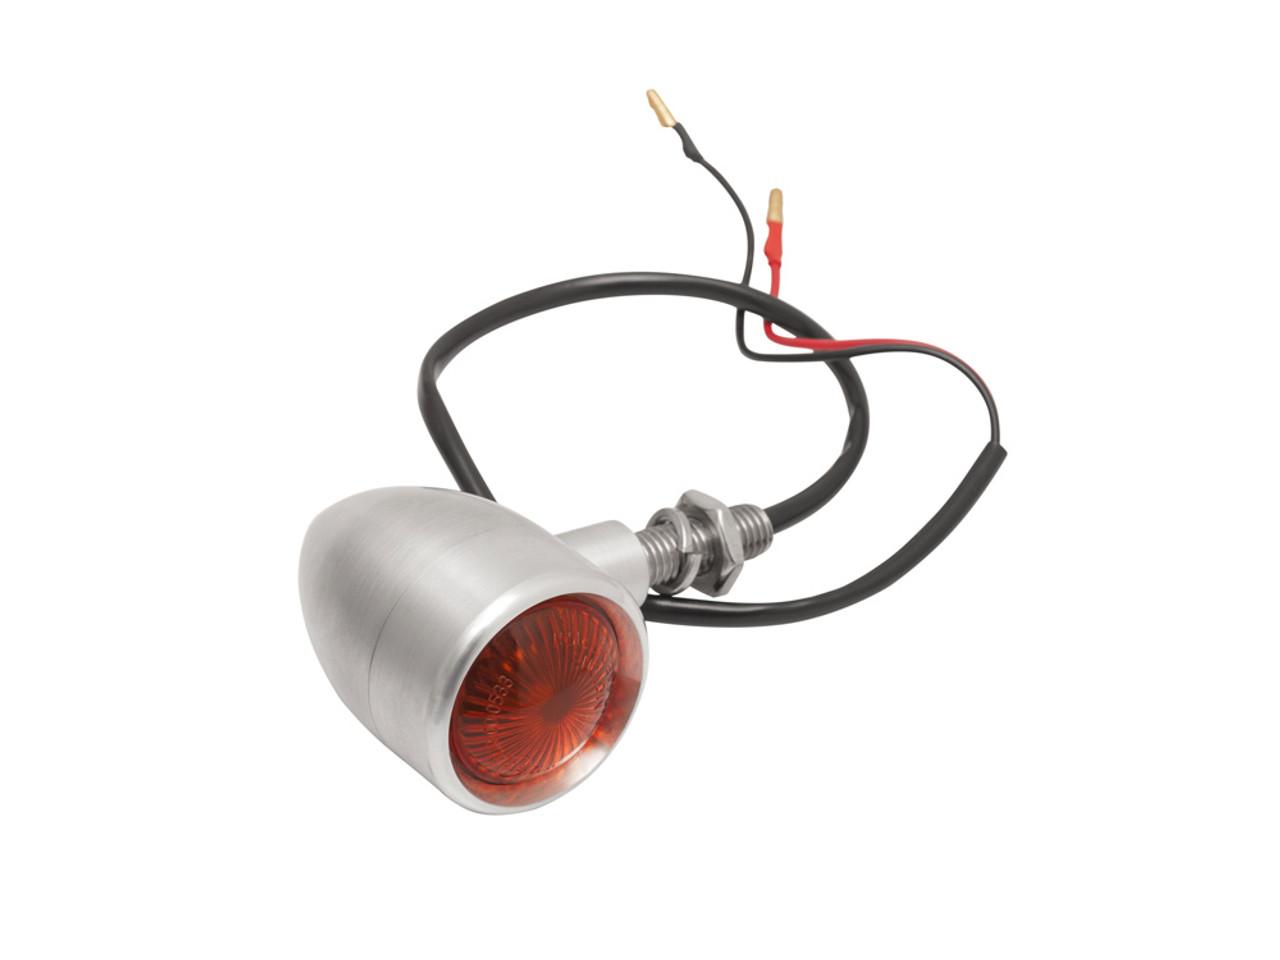 Billet Turn Signals - Pair - Brushed